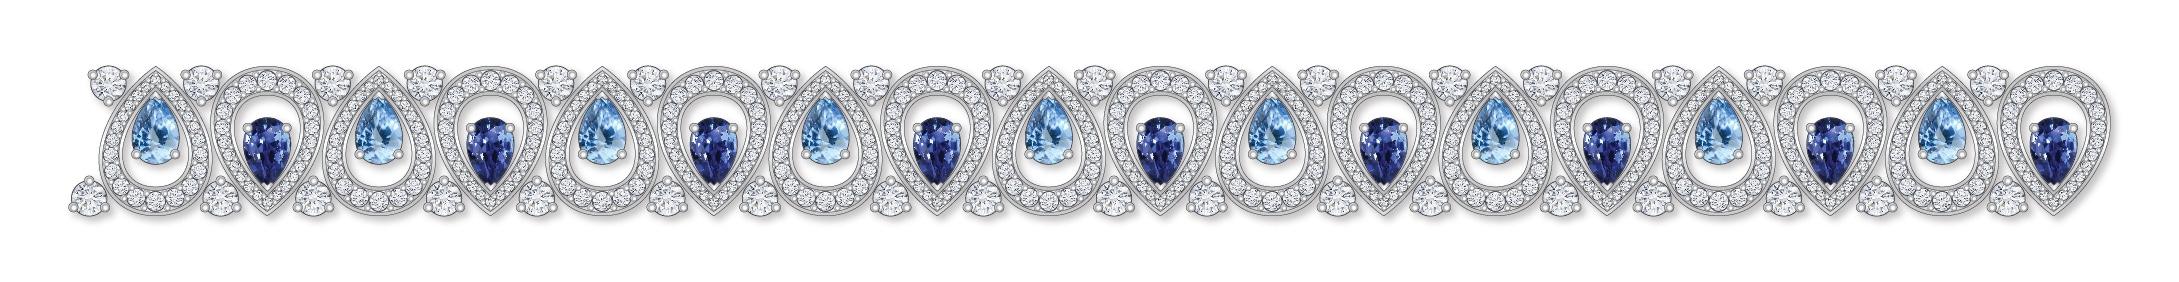 Dessin bracelet saphirs diamants or blanc